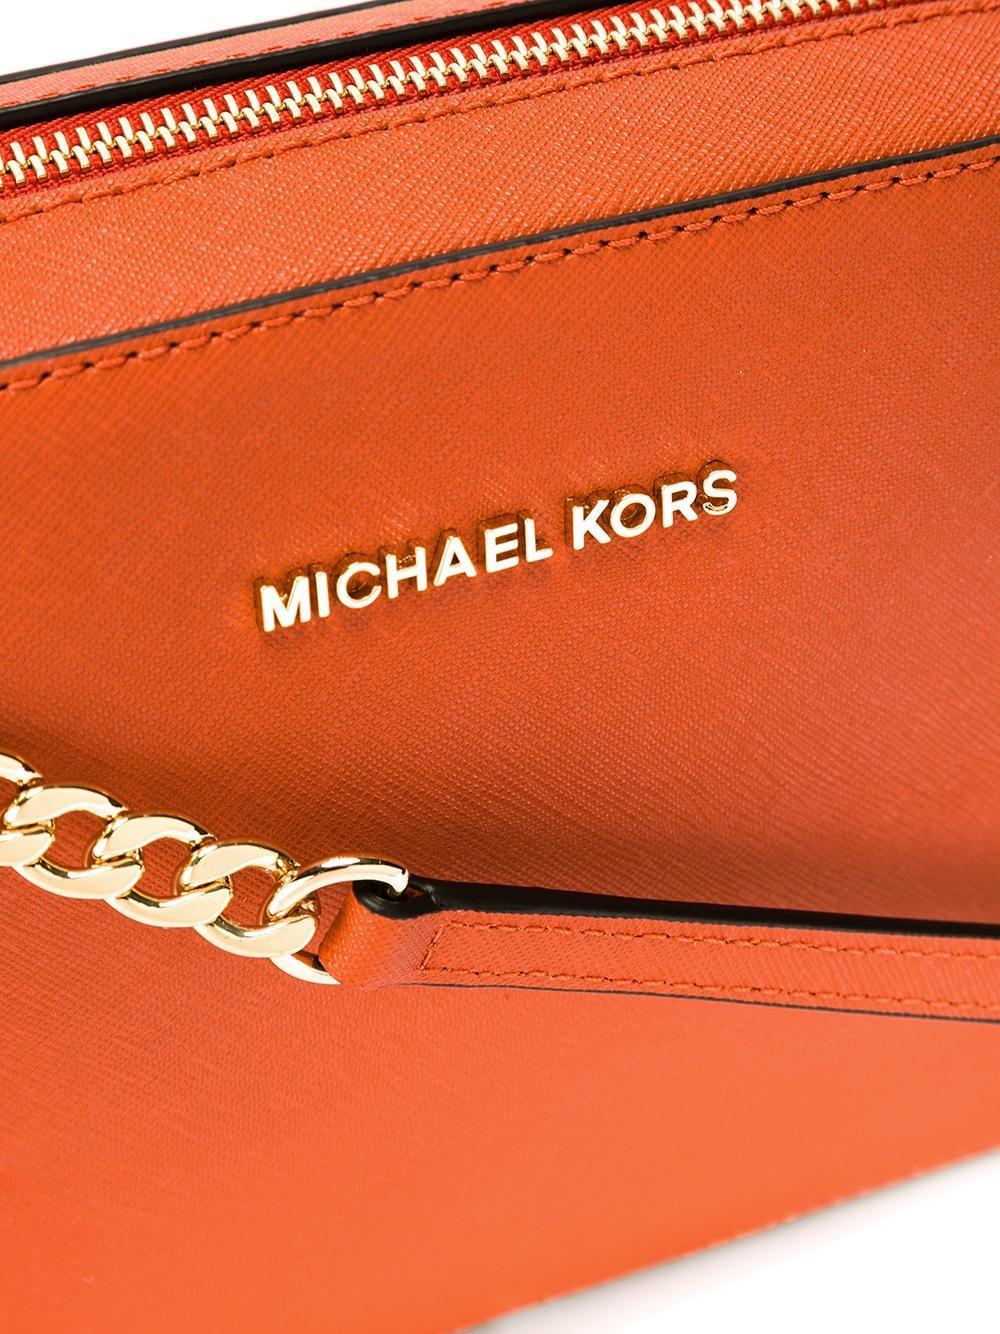 MICHAEL Michael Kors Leather Jet Set Crossbody Saffiano Large Pouch in Yellow & Orange (Orange)